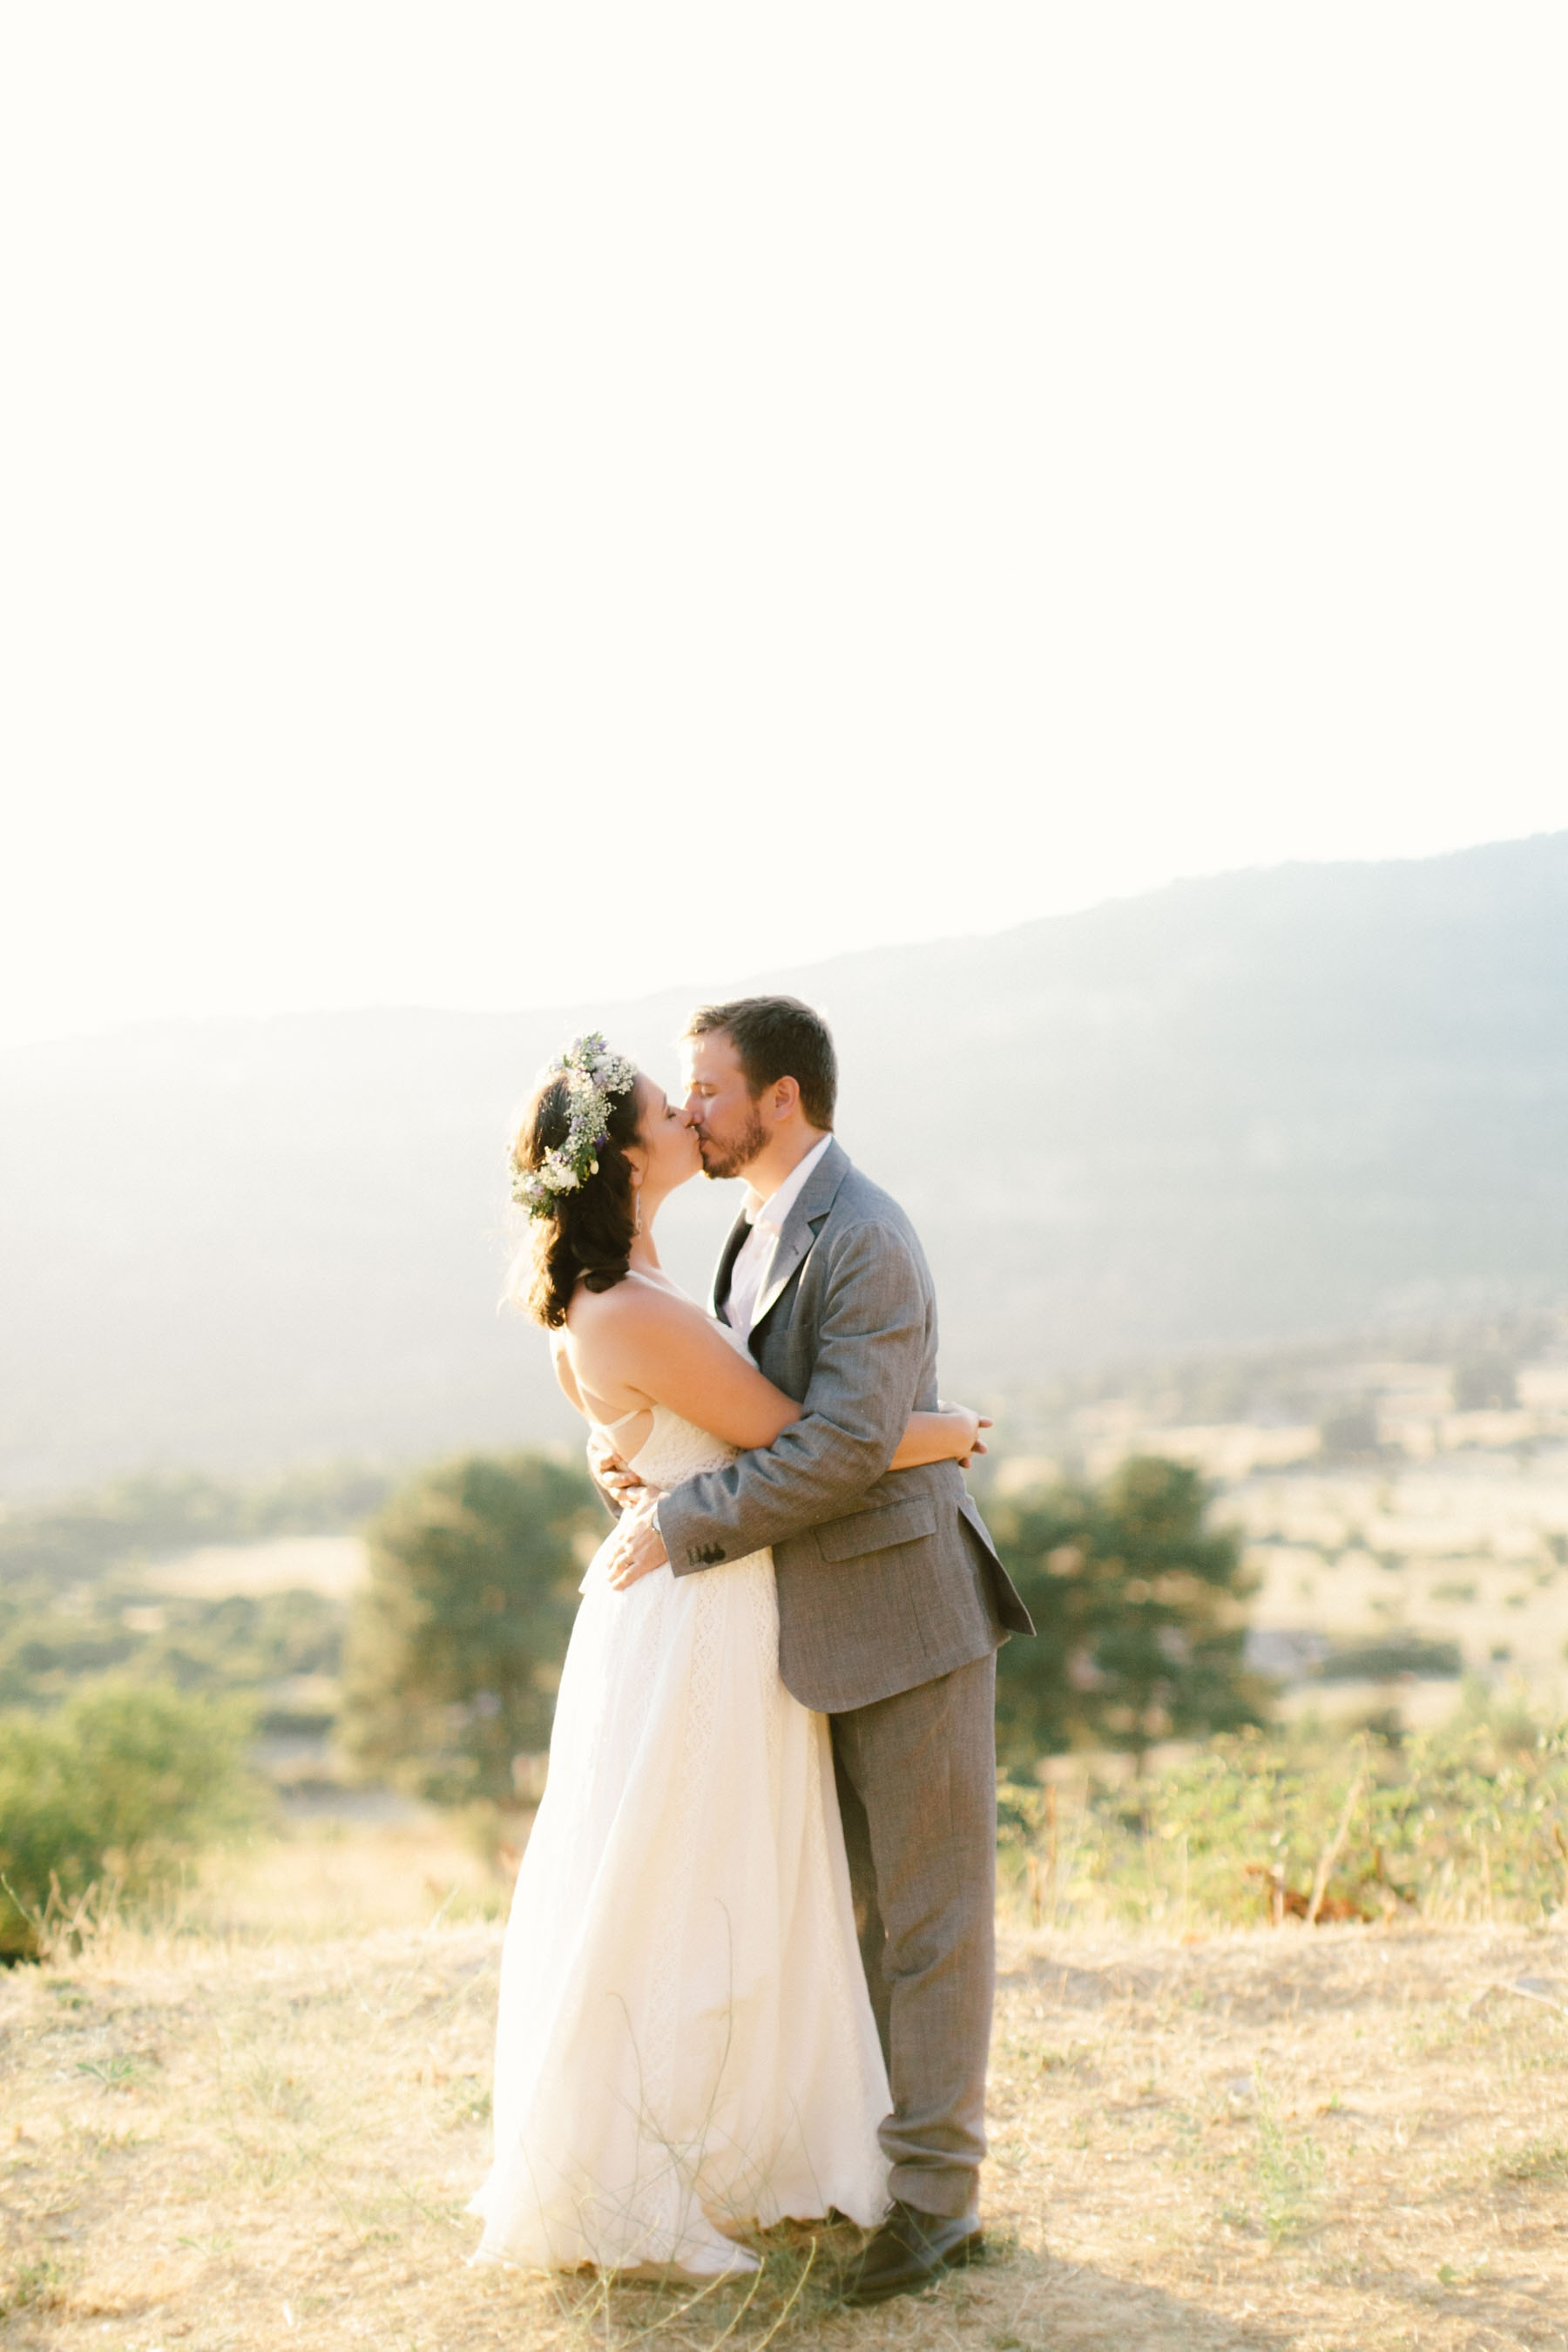 fotografo de bodas Jairo Crena-137